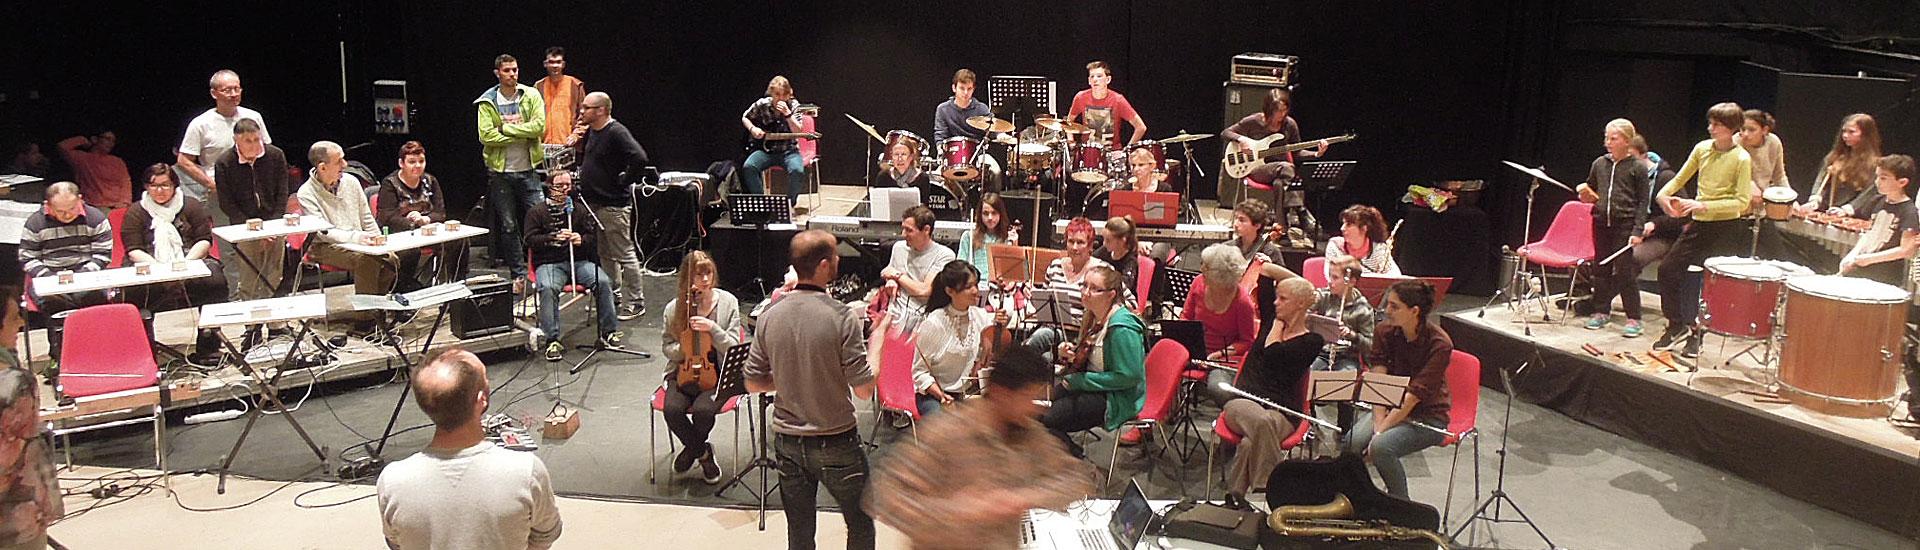 Aubenas - Salle Le Bournot - Mai 2016